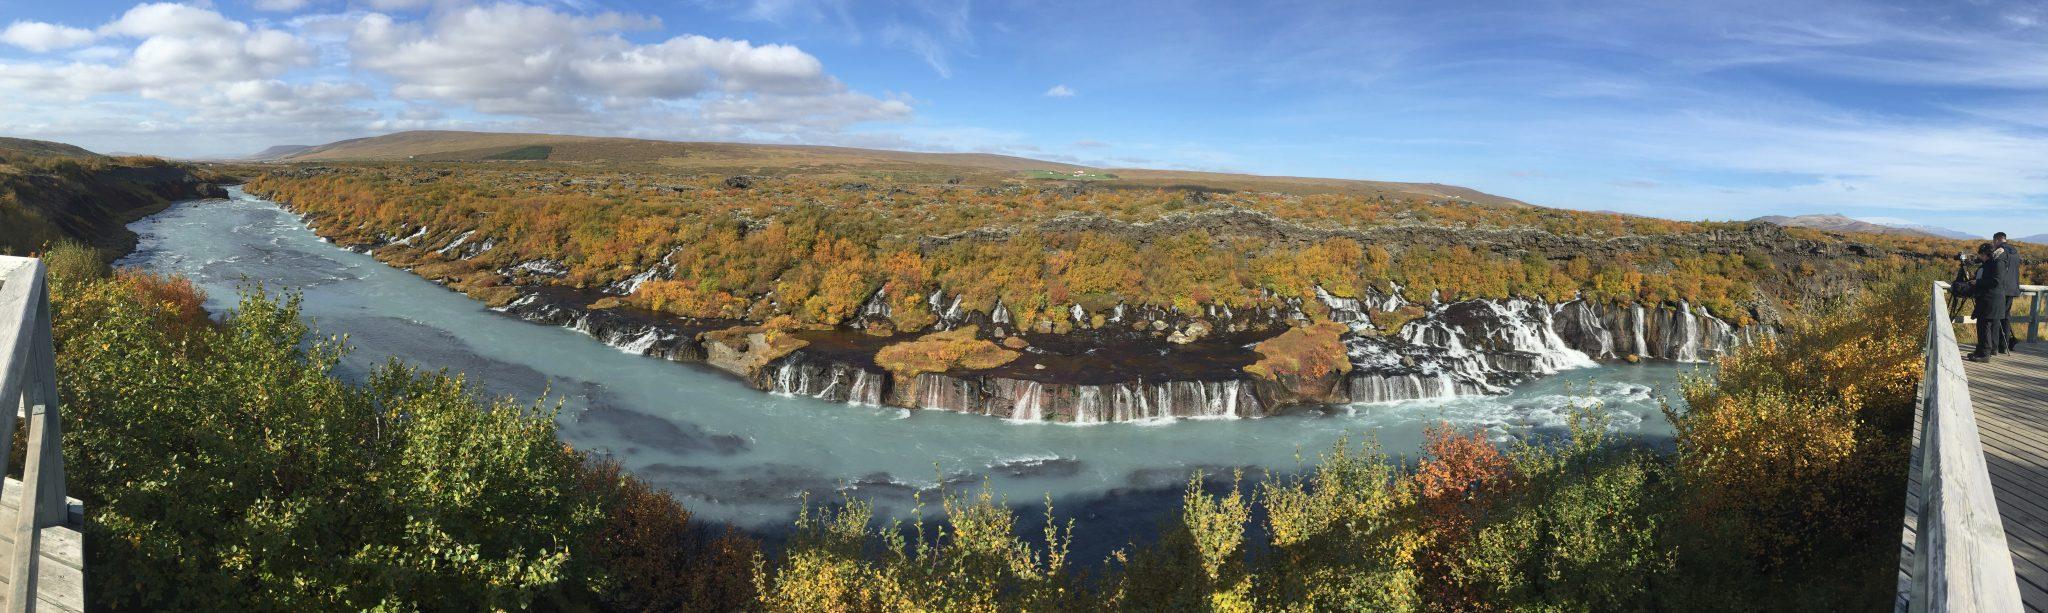 Seeing Iceland While Asleep